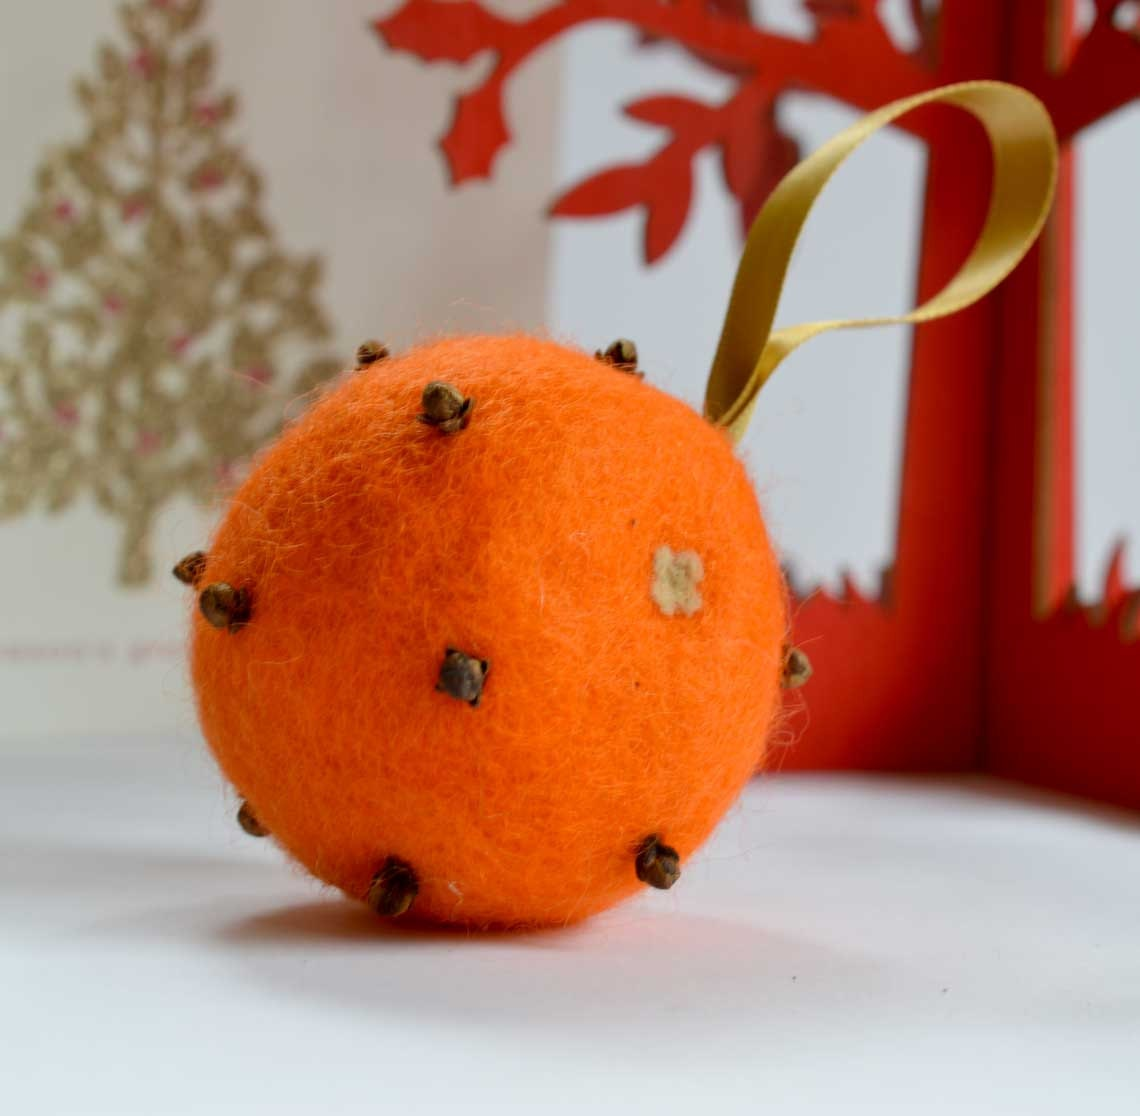 Wool felt ornaments - Felted Clove Studded Orange Pomander Christmas Ornament Christmas Tree Decoration Orange Scented Wool Felt Christmas